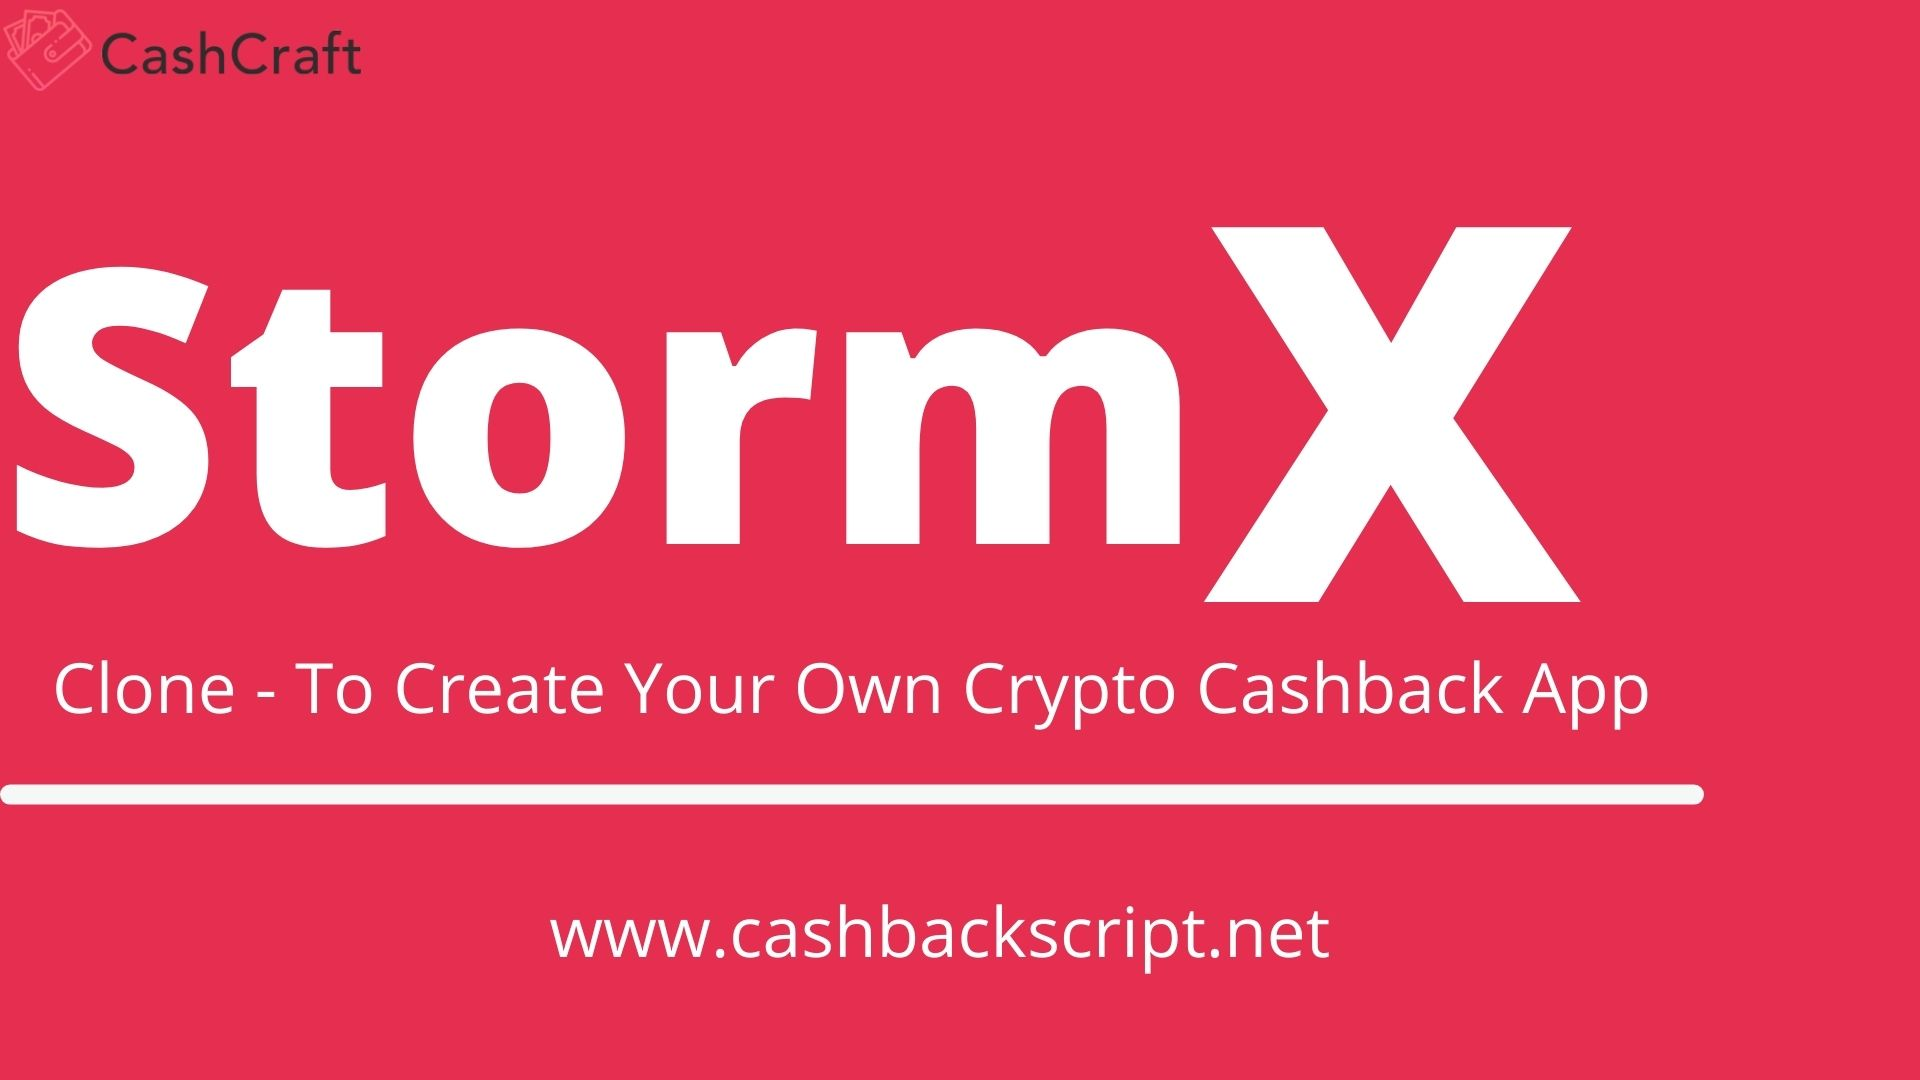 StormX Clone: Launch Your Own Crypto Cashback reward App Like StormX